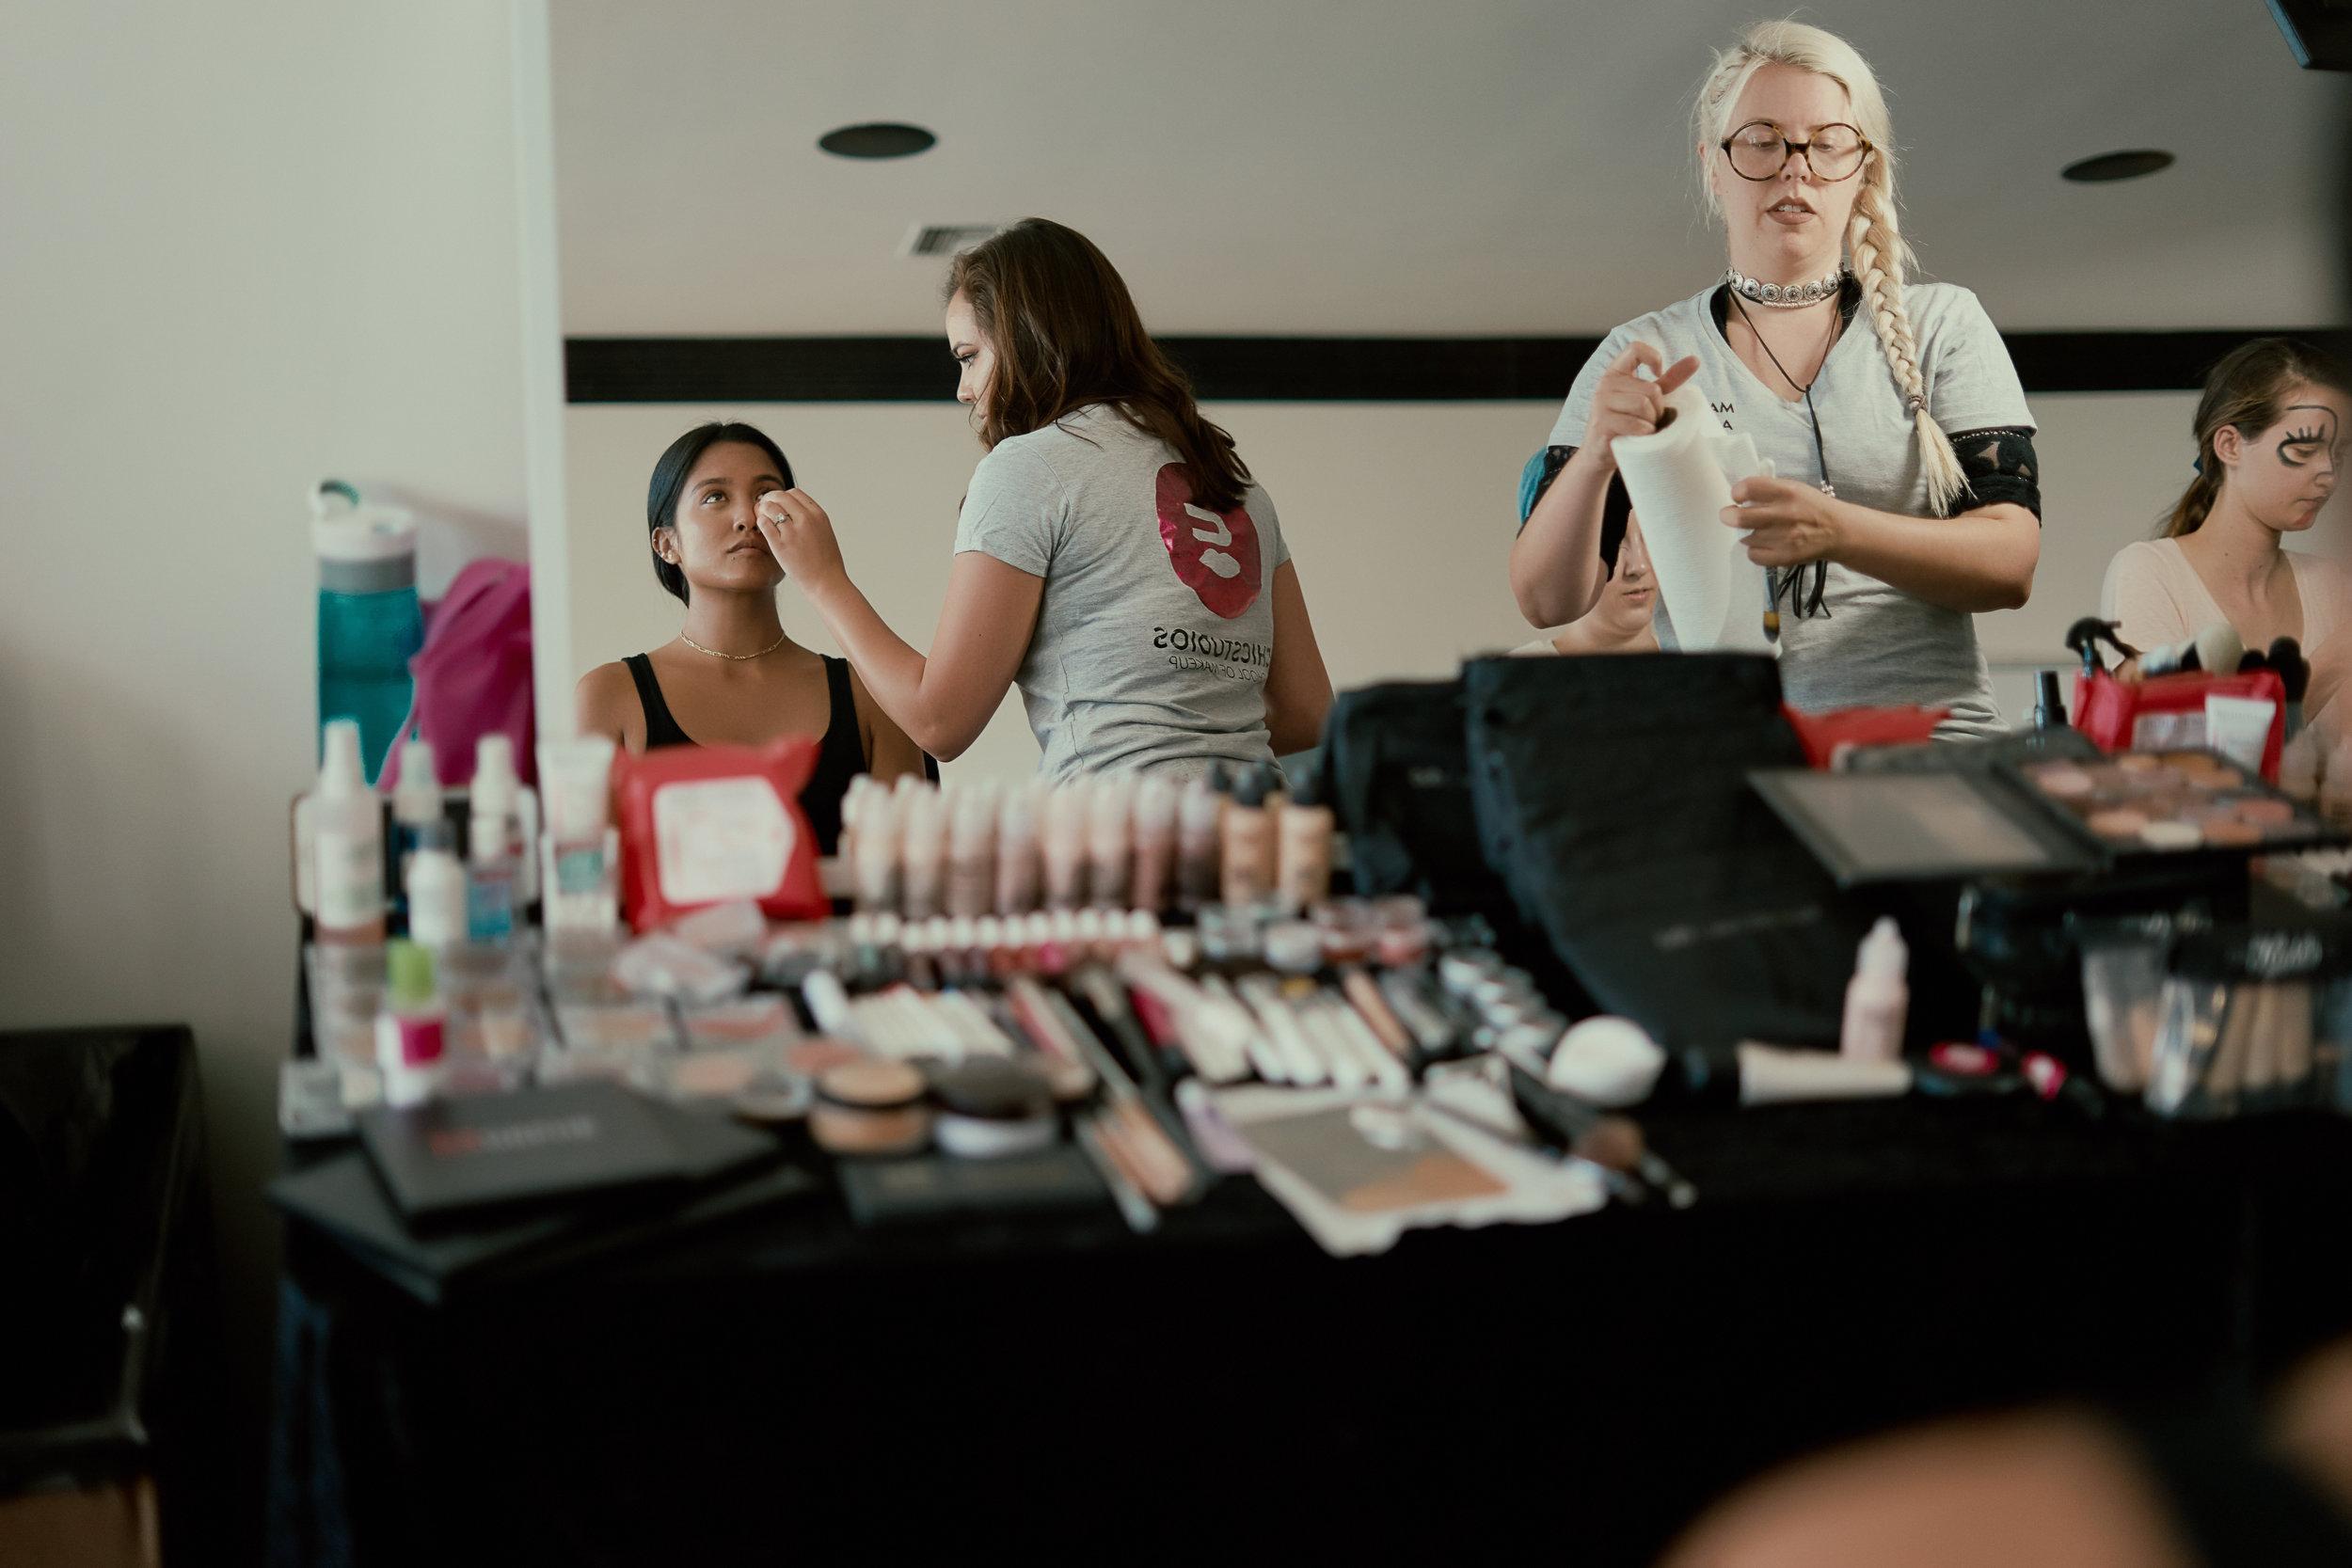 Makeup by Megan Urbano of Chic Studios